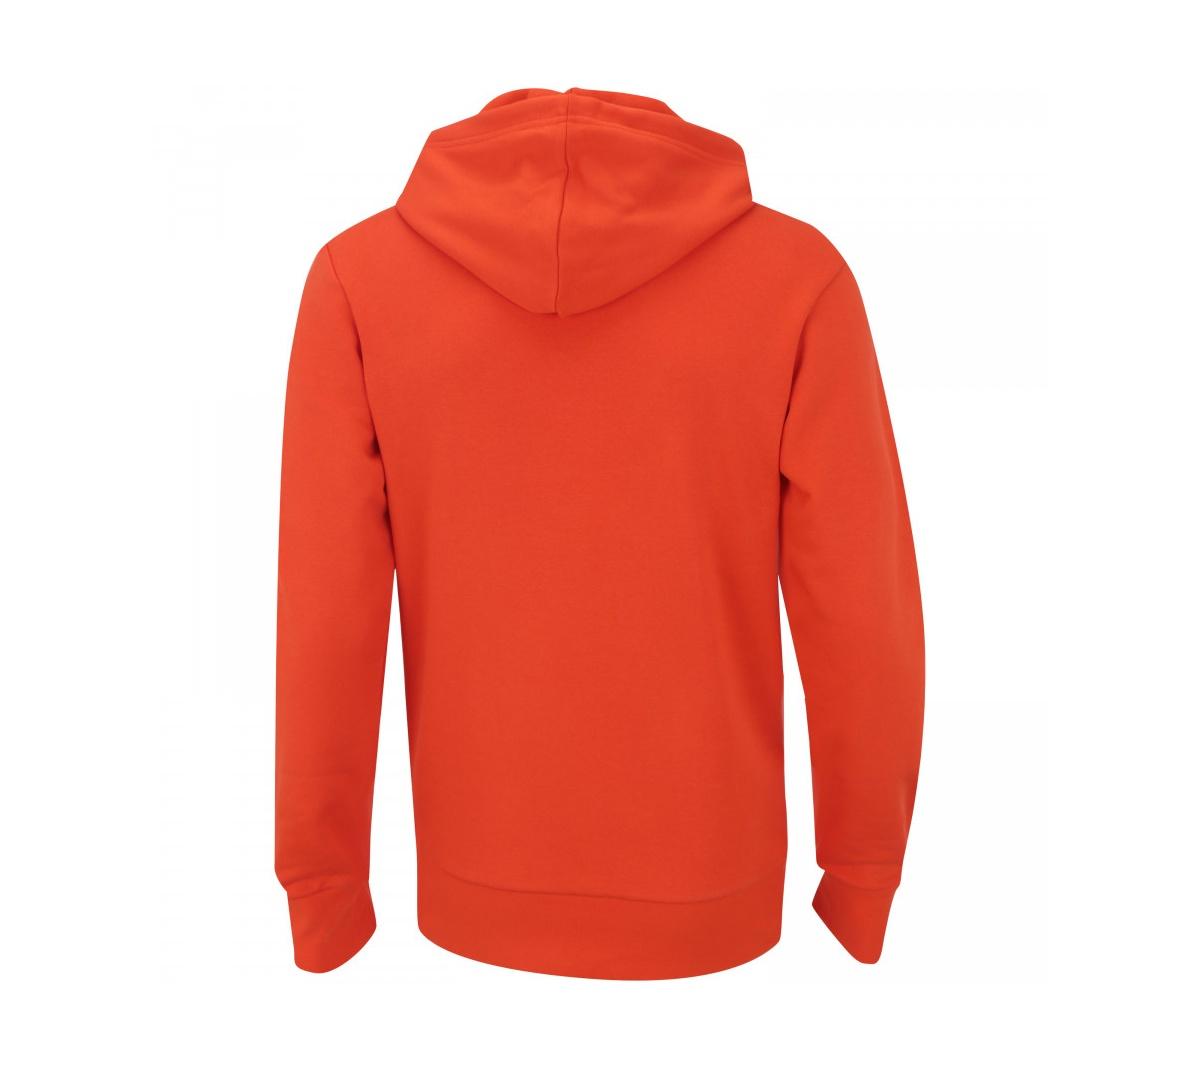 Blusa Adidas Yb Logo Hood Infantil